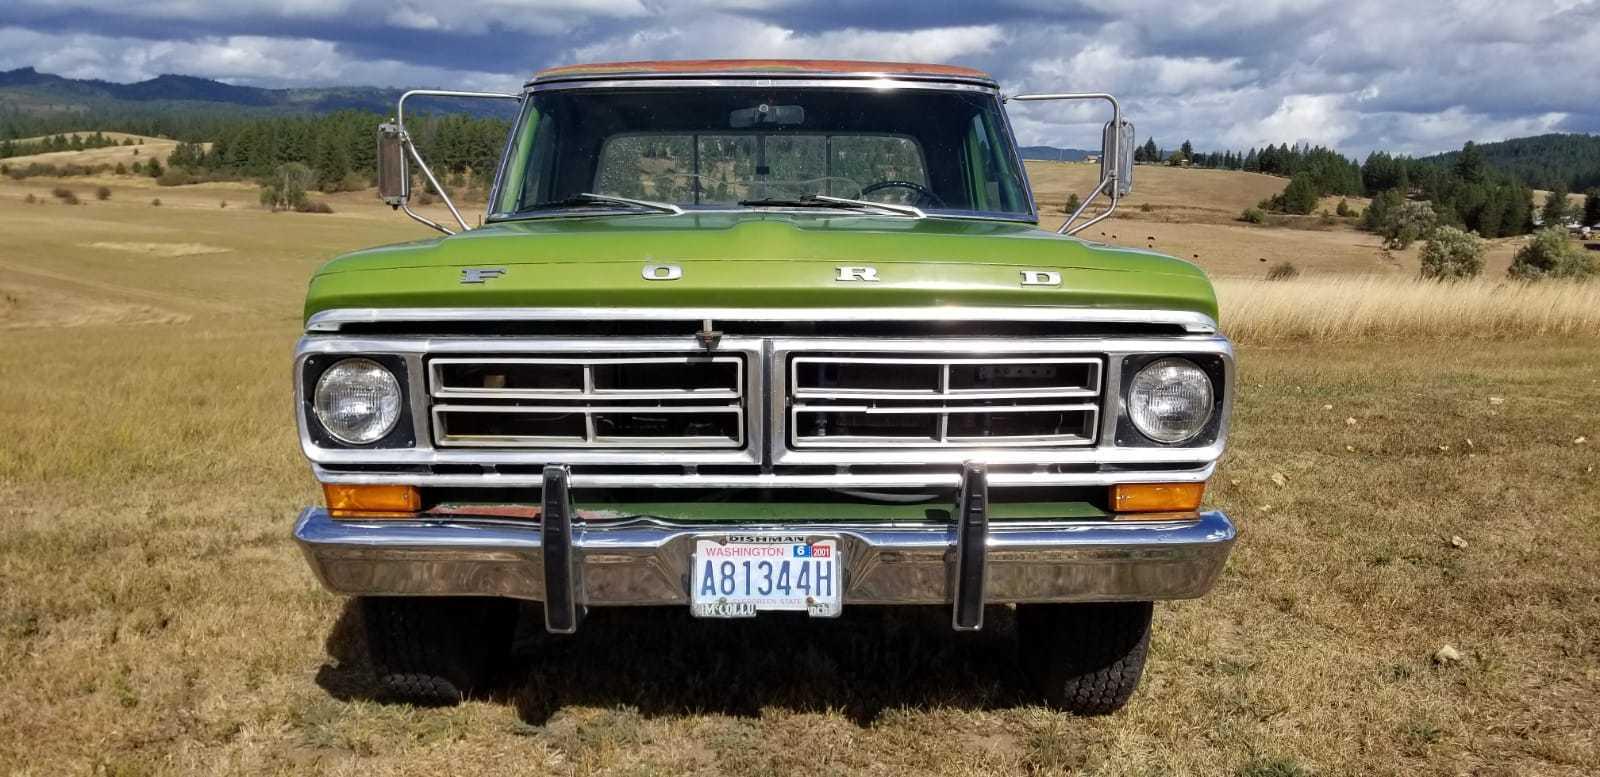 1972-Ford-F250-Camper-Special-Explorer-360ci-V8-13